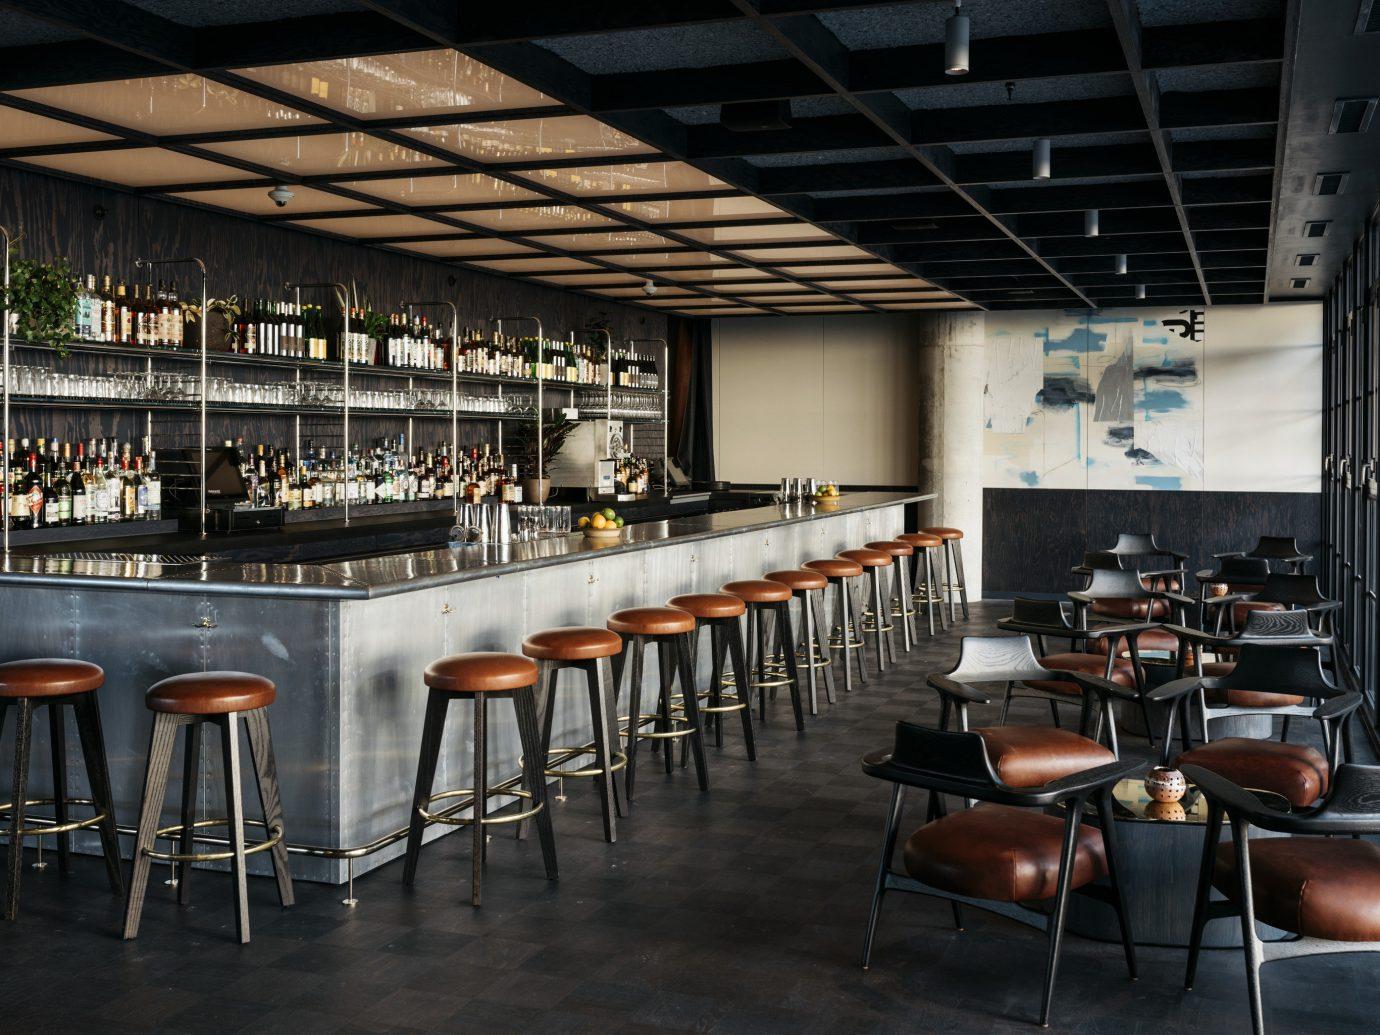 Food + Drink floor indoor table ceiling chair restaurant interior design Bar dining room several